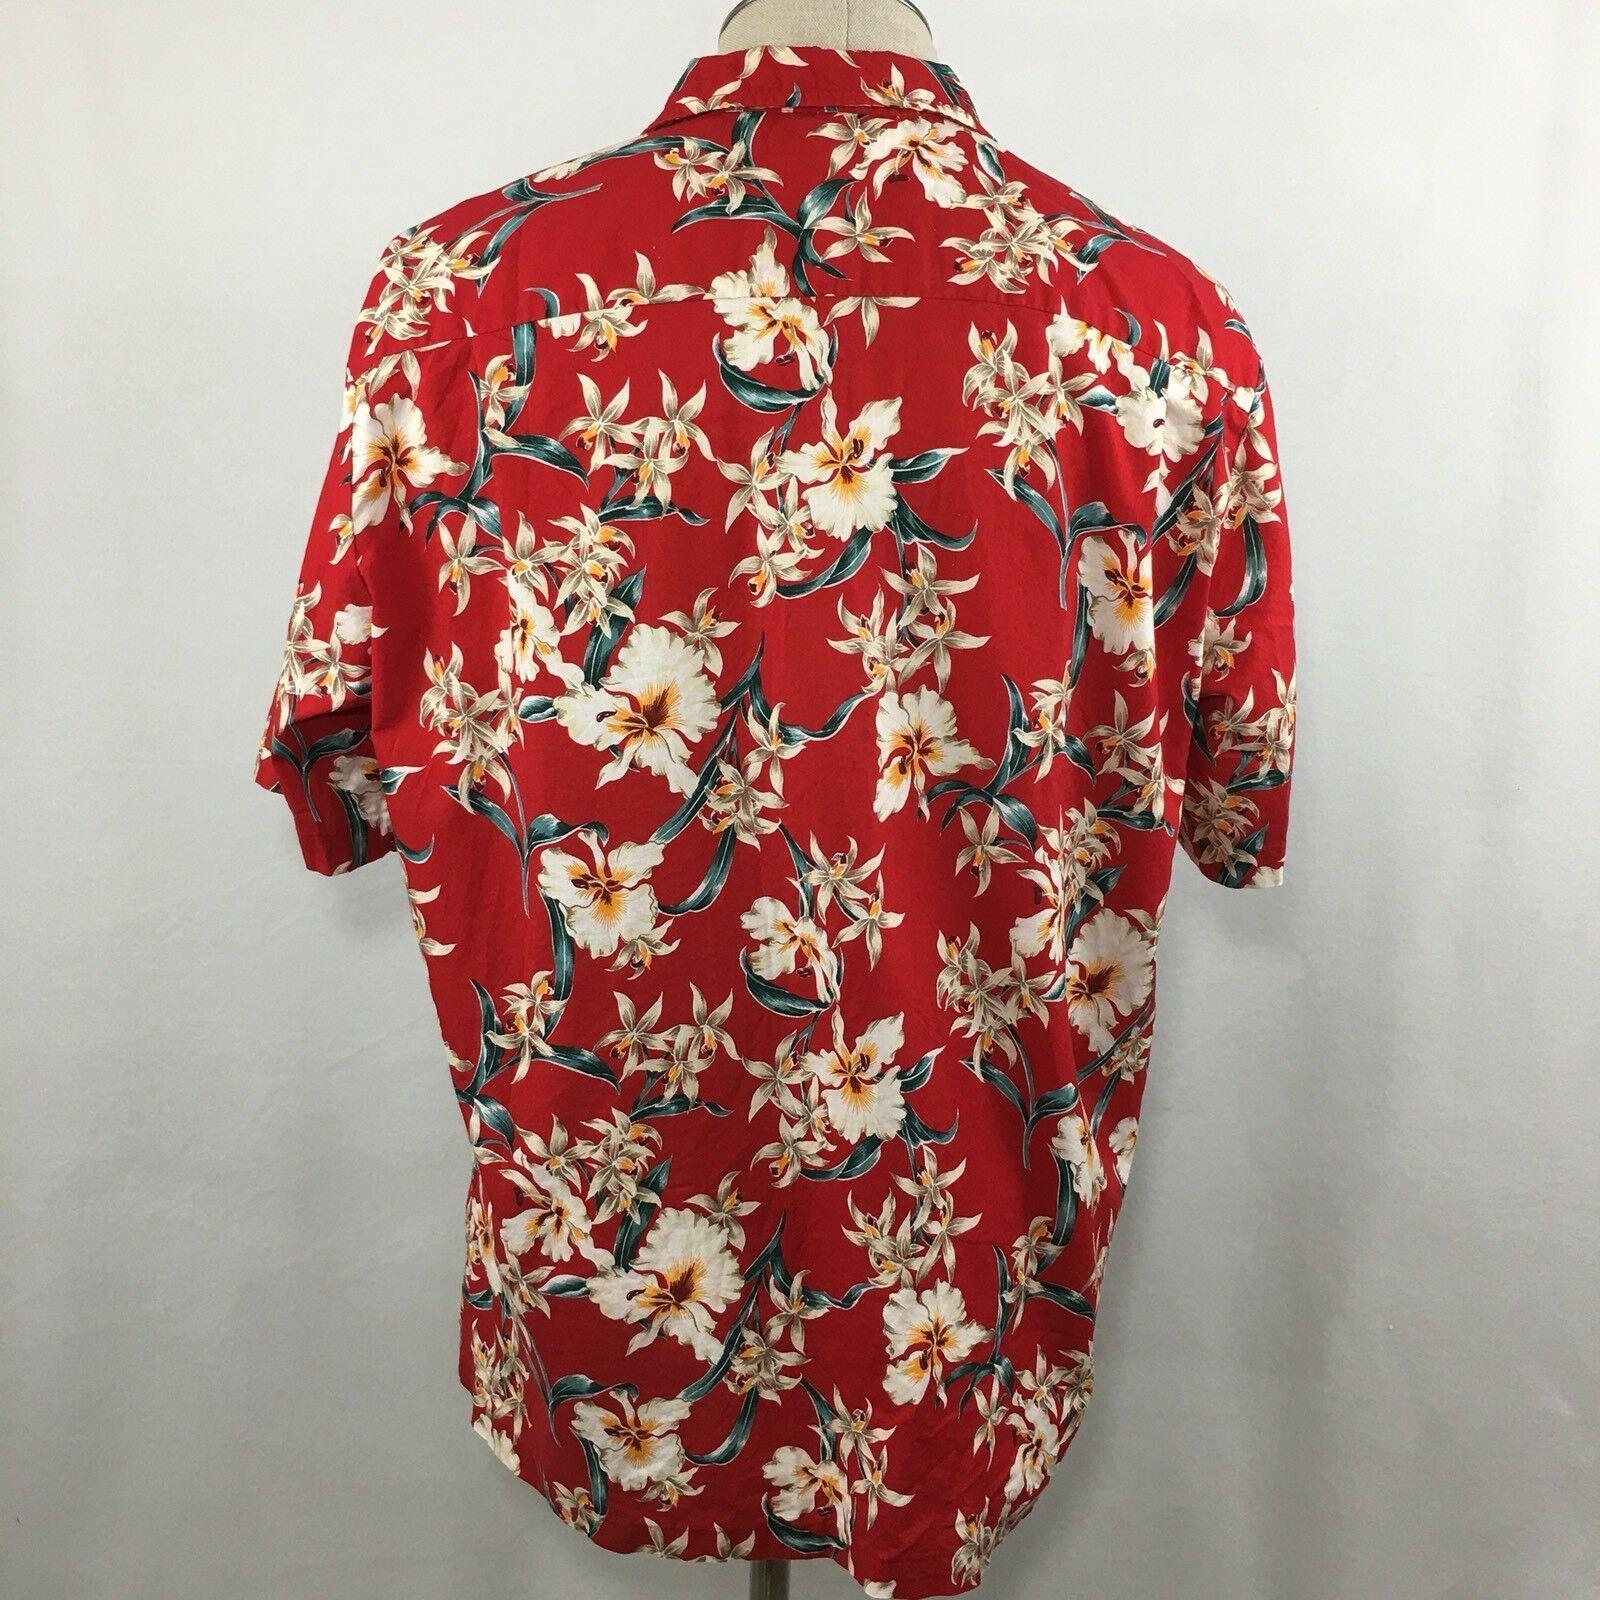 Royal Creations Mens Hawaiian Shirt Size XL Red Welt Pocket Aloha VTG Made USA